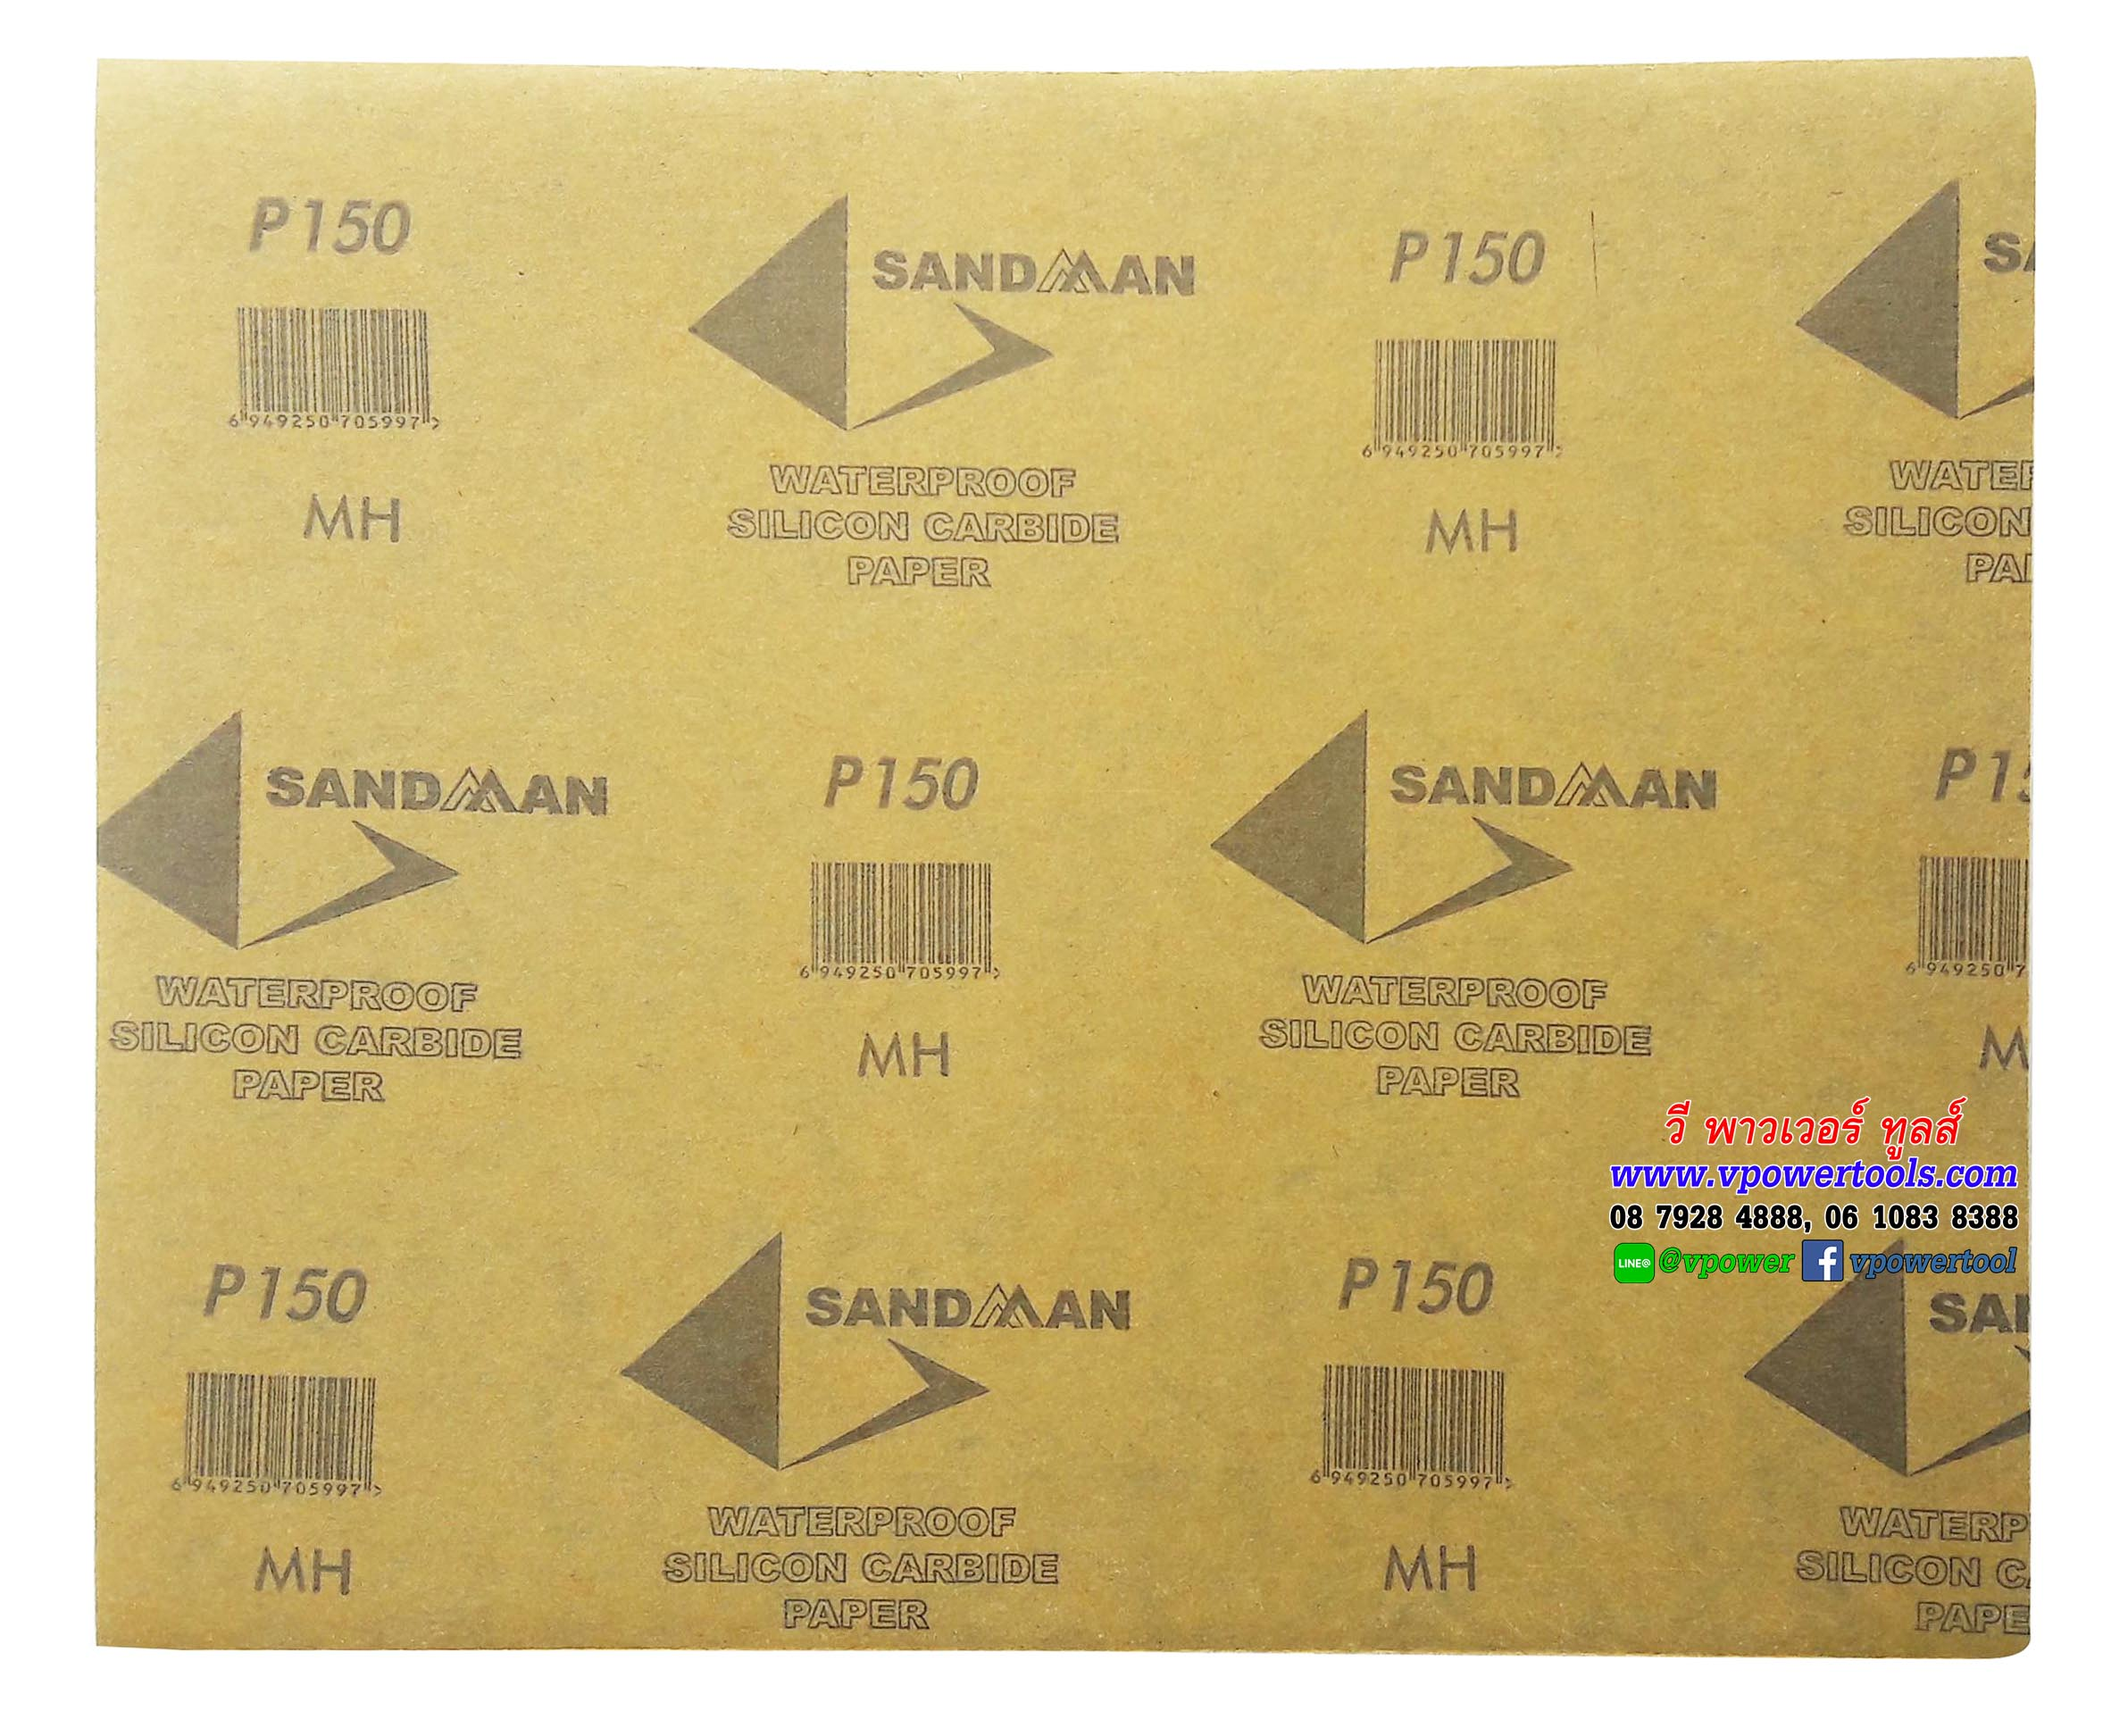 "SAND MAN C168 กระดาษทรายน้ำ แซนด์แมน ขนาด 9 x 11"" (230 x 280 mm.)"